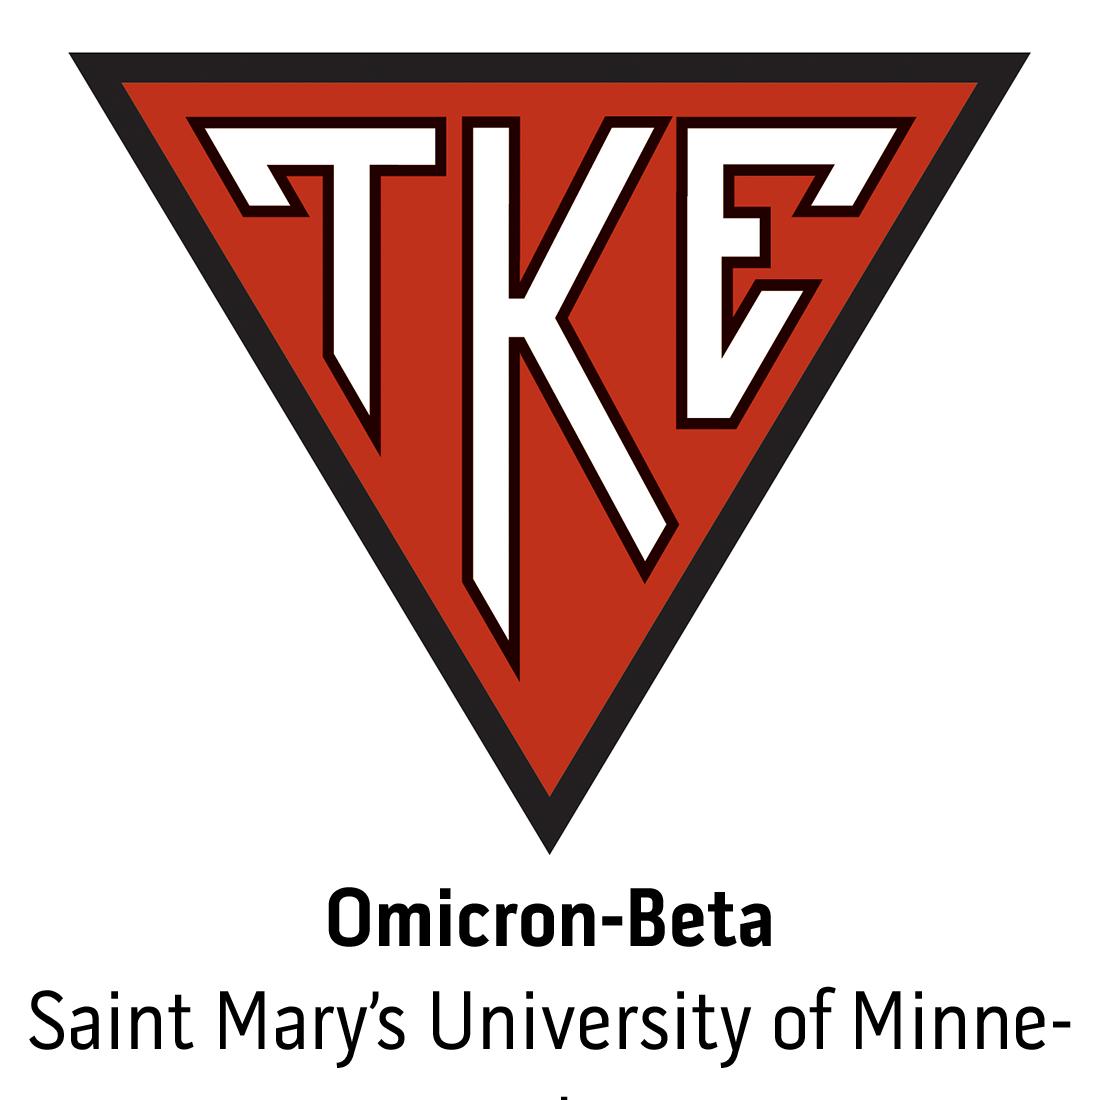 Omicron-Beta Chapter at Saint Mary's University of Minnesota